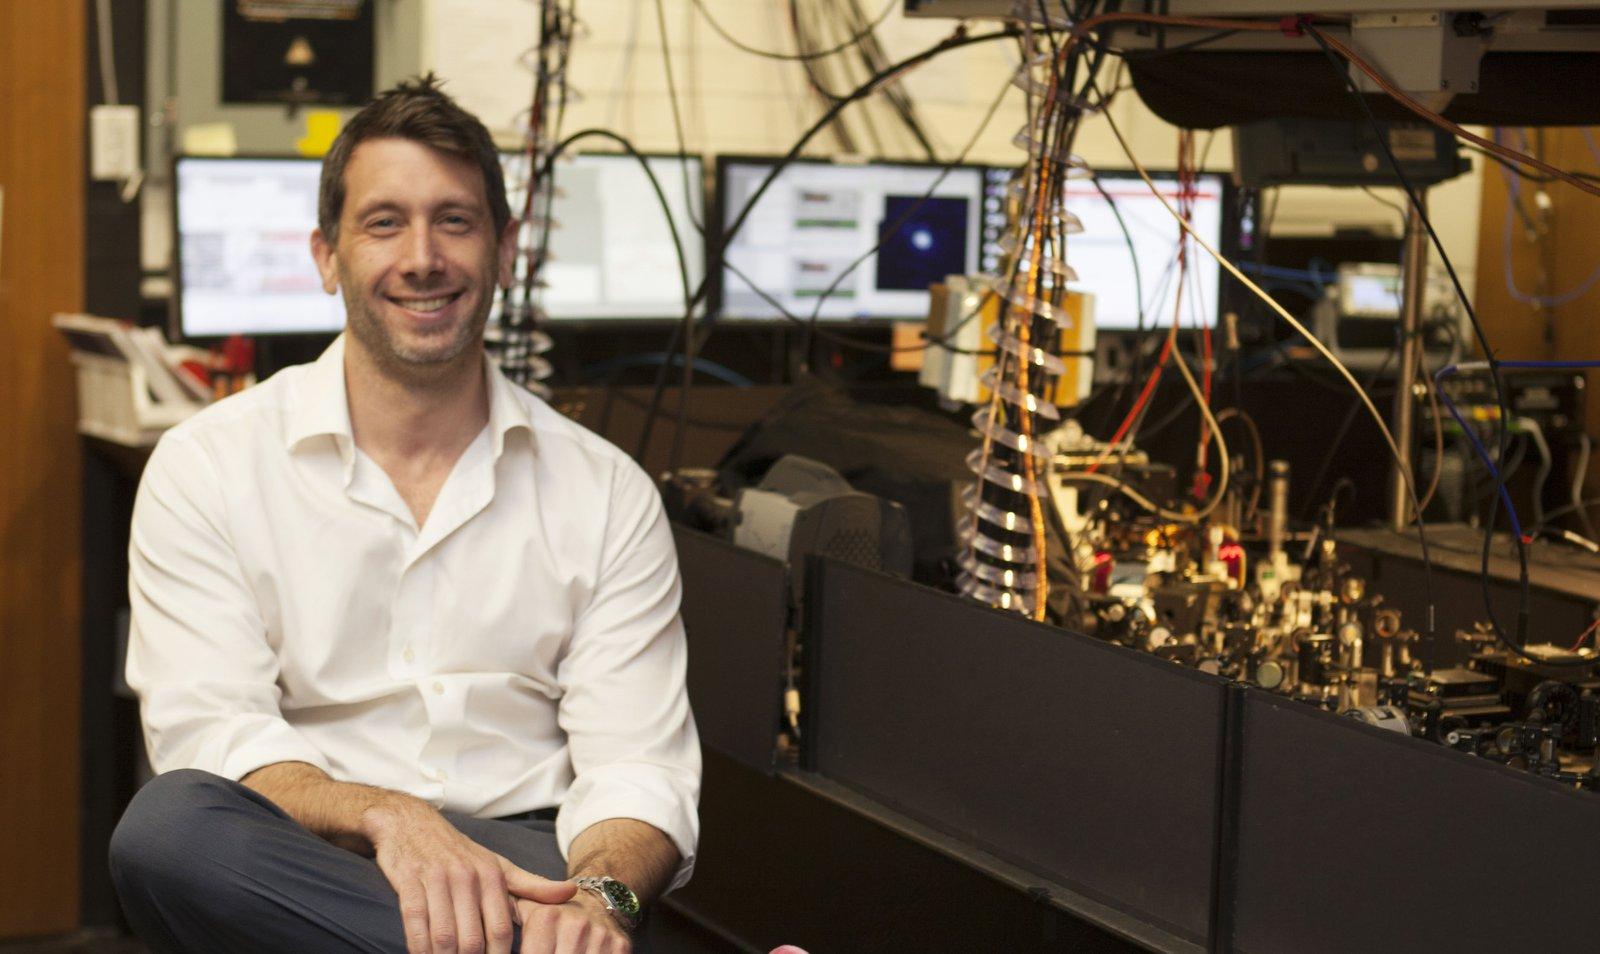 Associate Professor Michael Biercuk